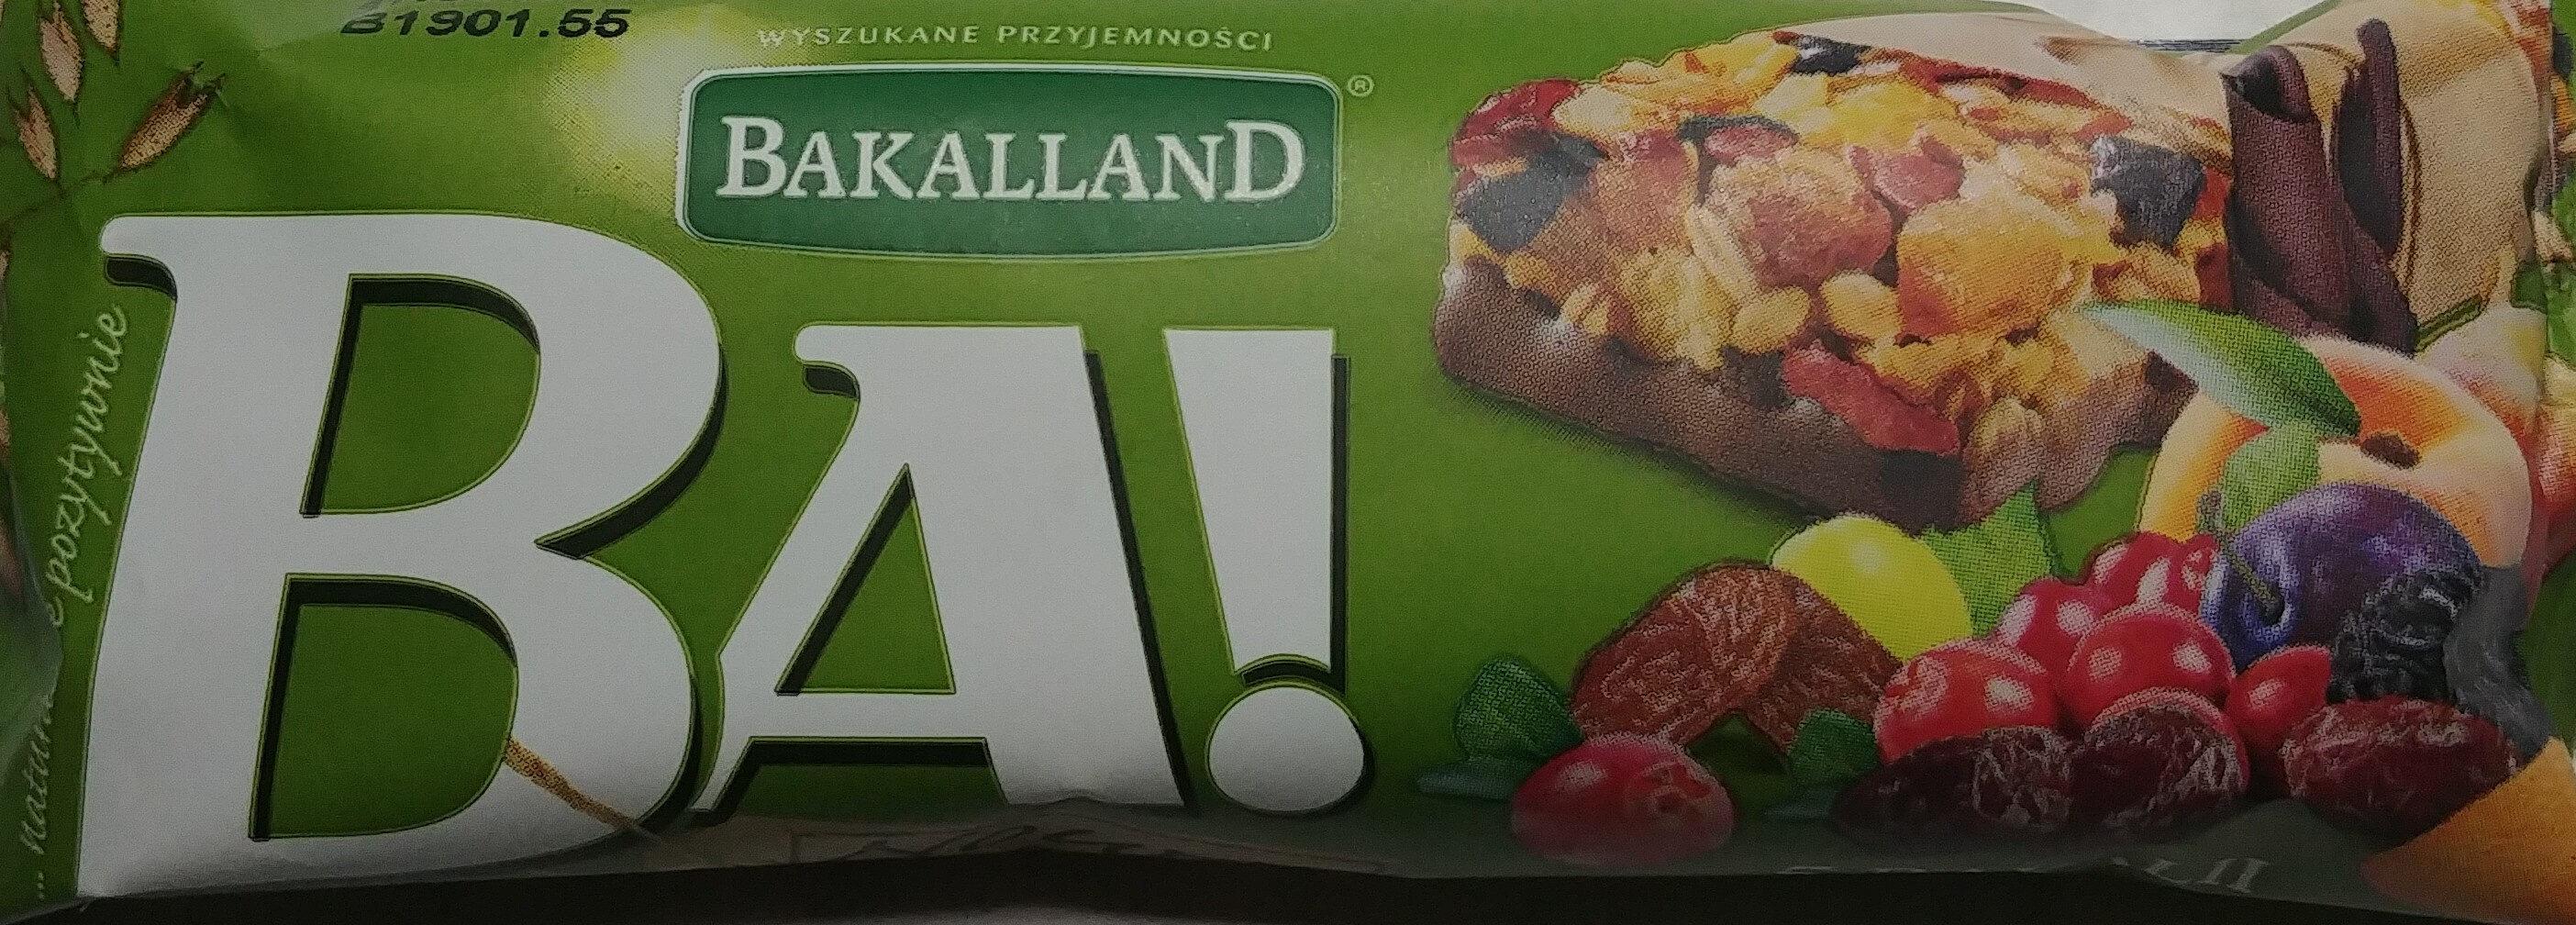 Ba! 5 Bakalii - Product - pl